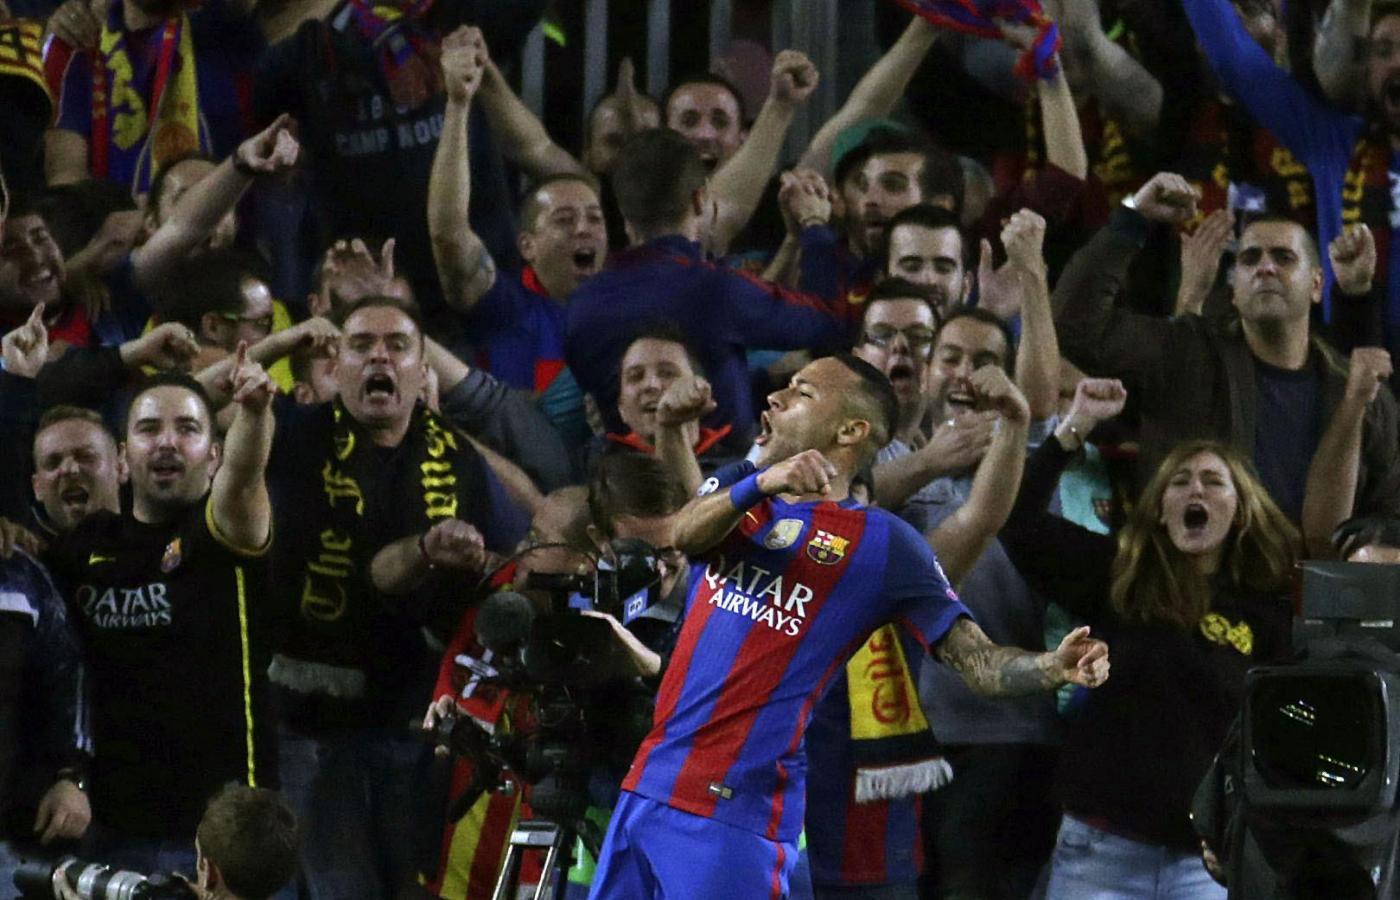 Chiesti 2 anni di carcere per Neymar